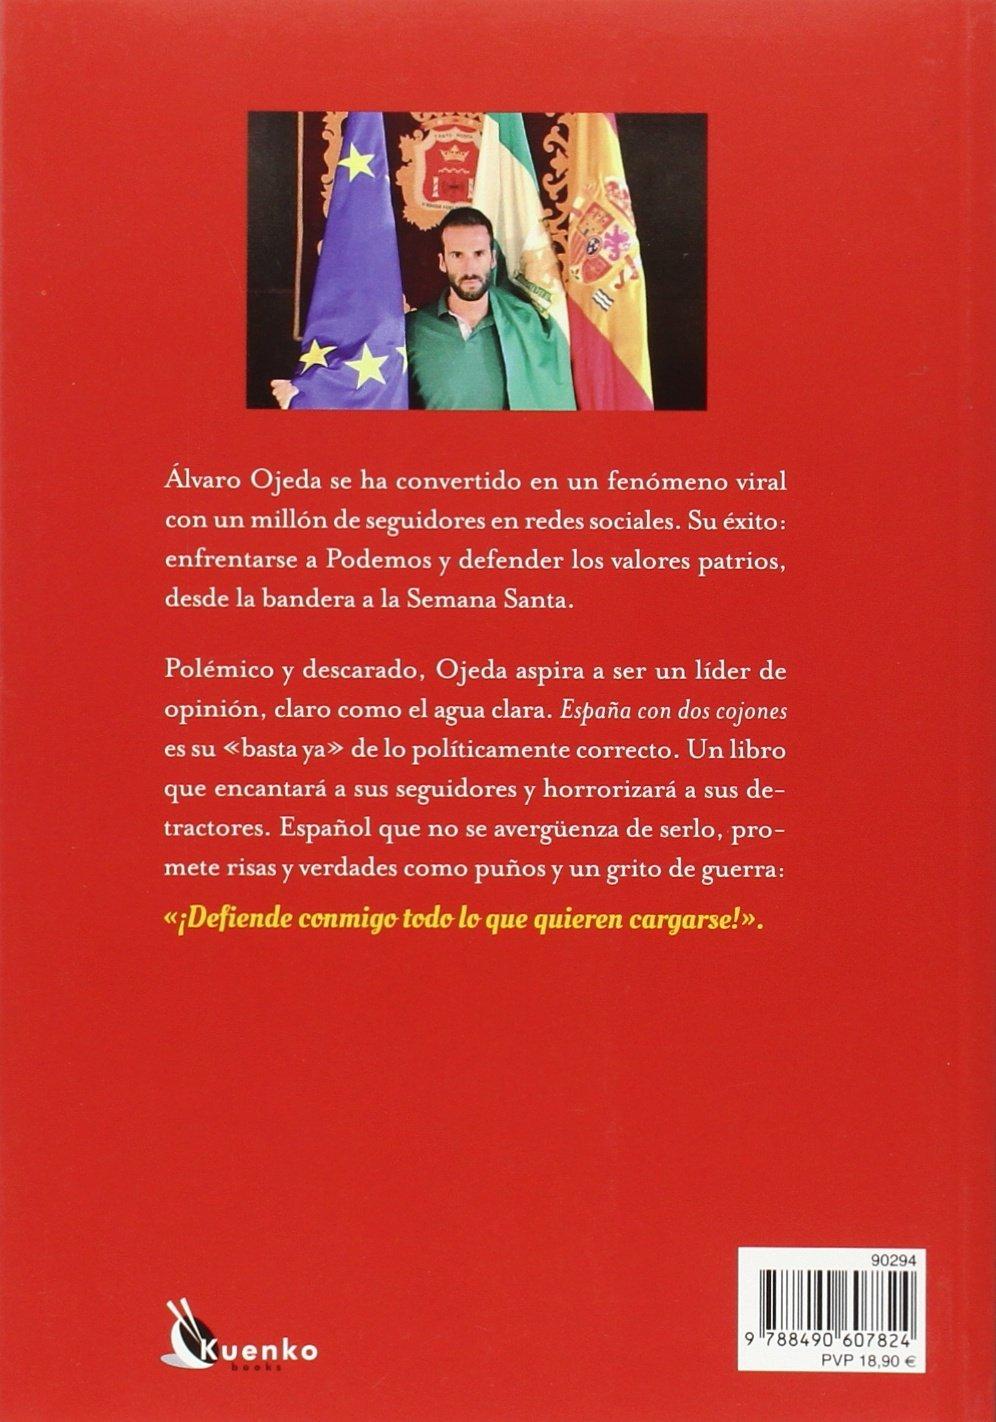 España Con Dos Cojones (Kuenko Books): Amazon.es: Ojeda Sacaluga, Álvaro, Inda Arriaga, Eduardo: Libros